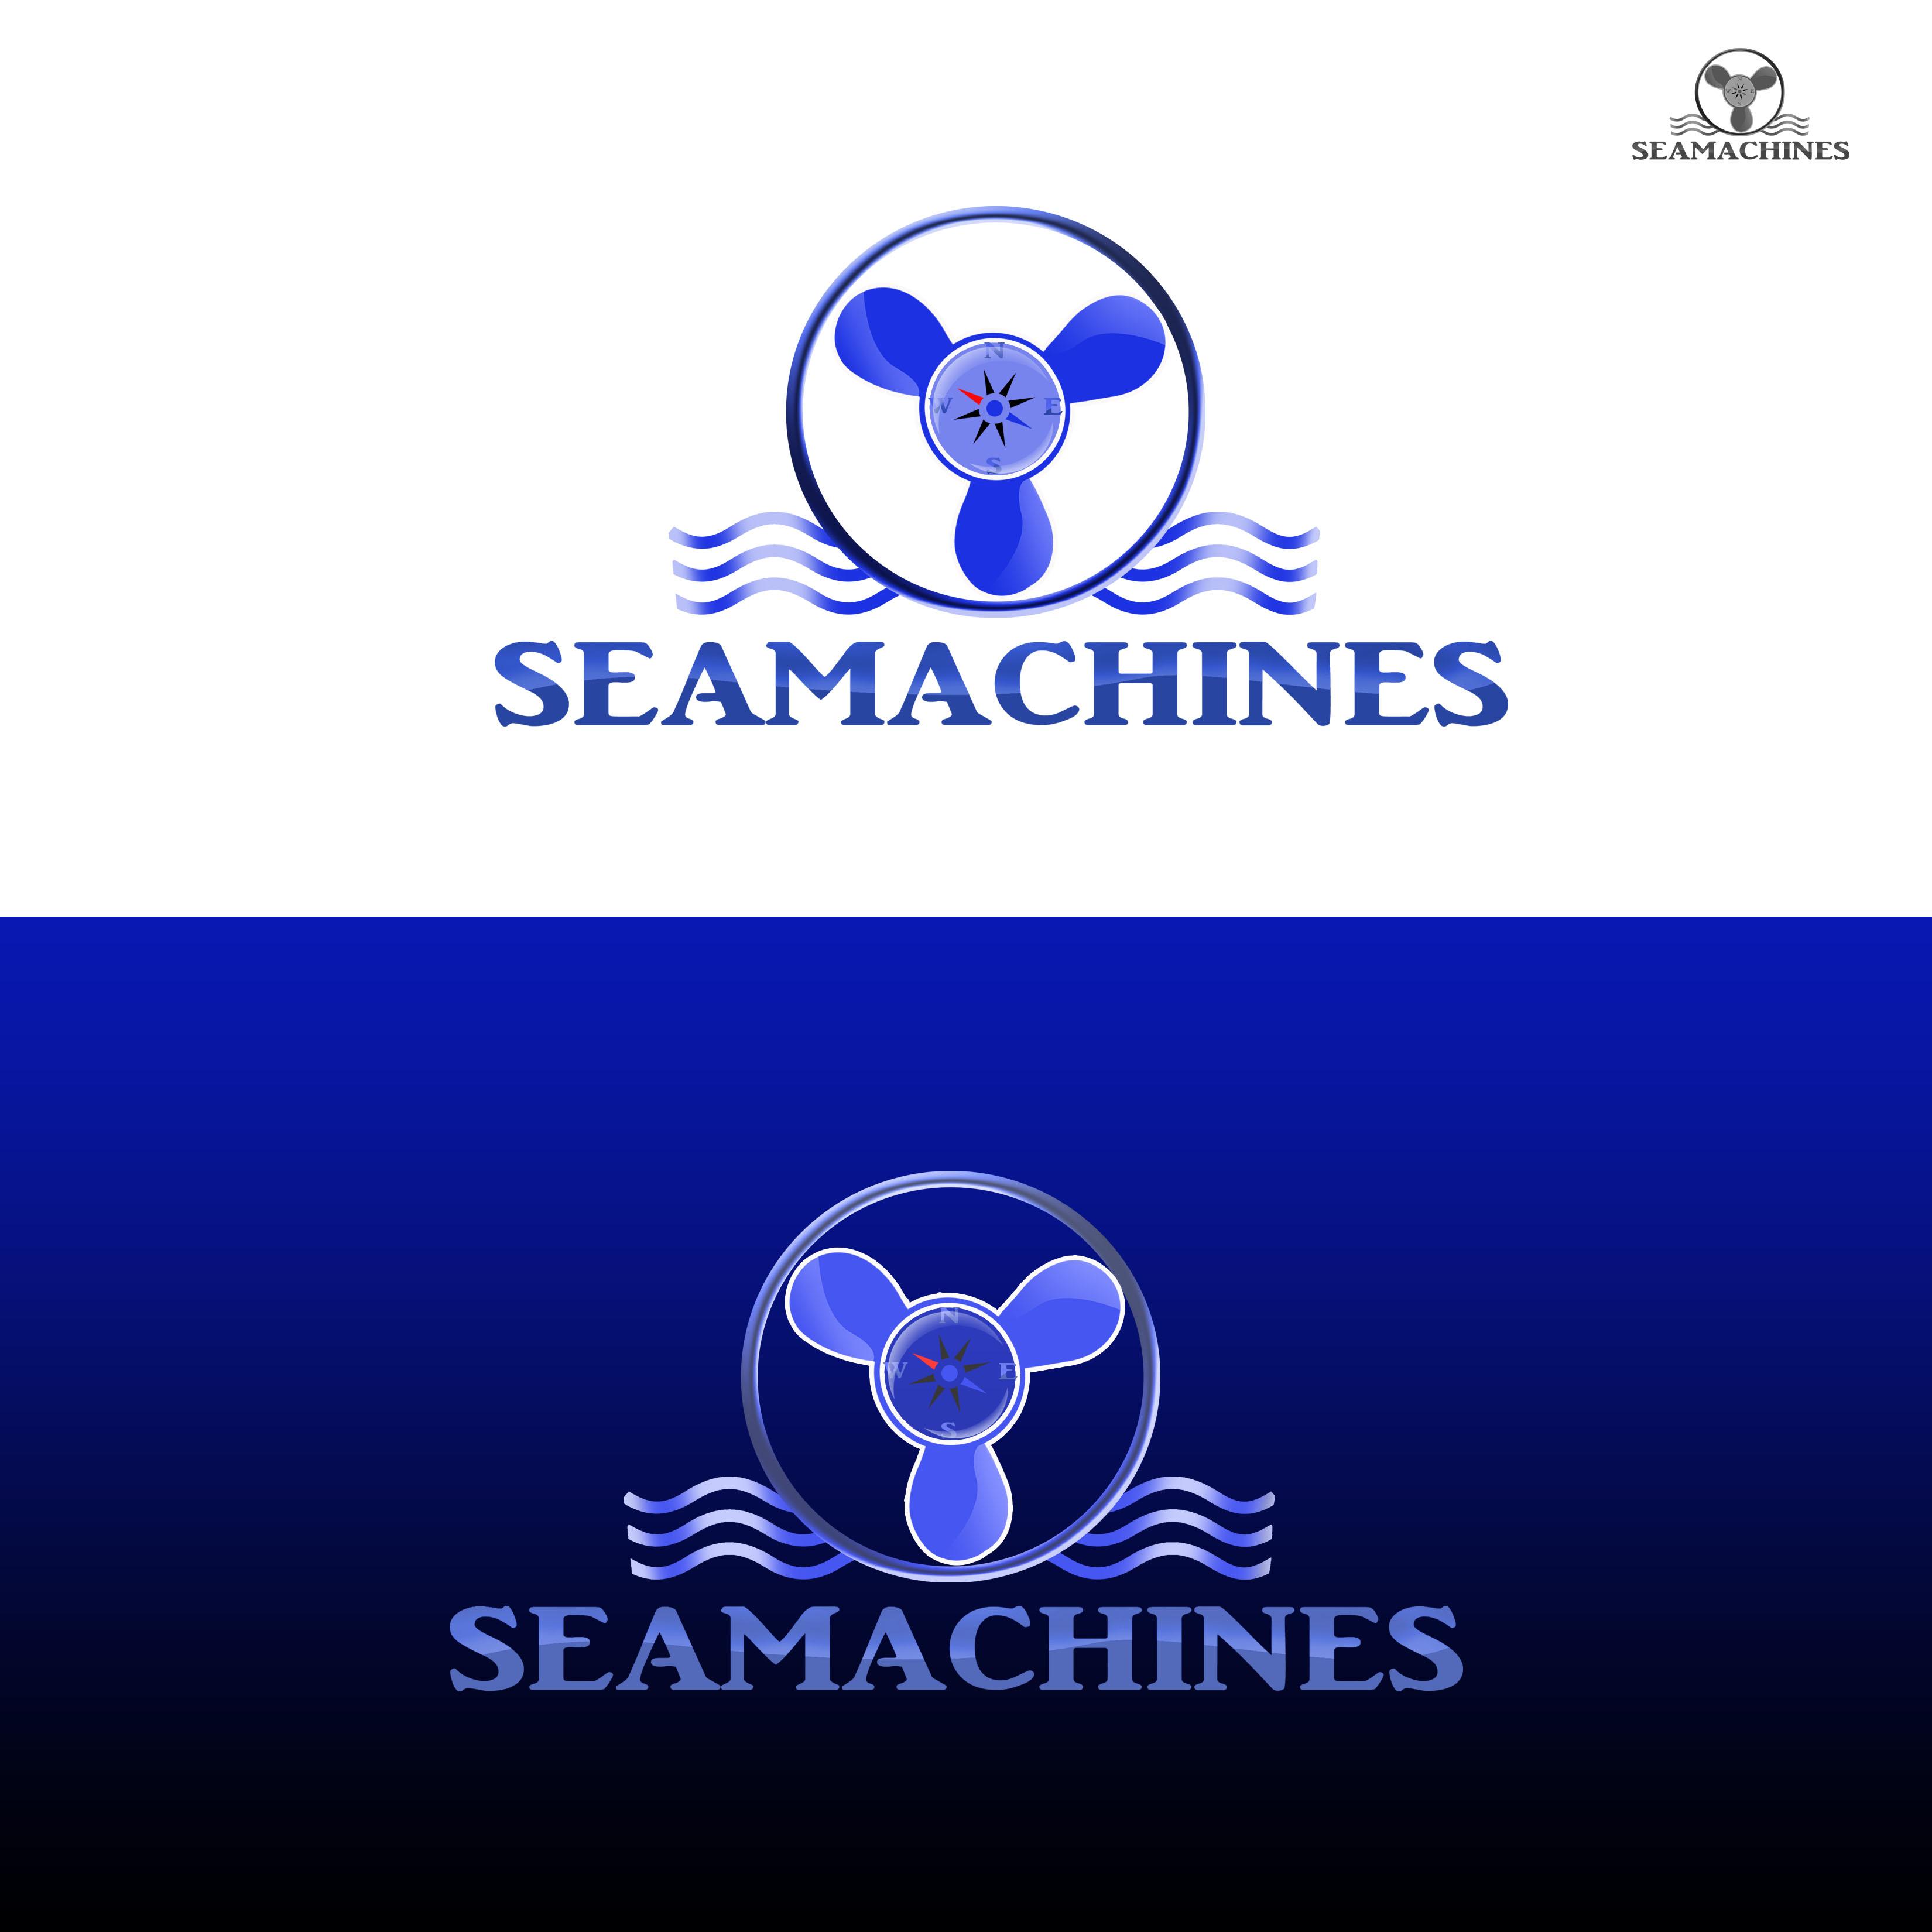 Logo Design by Allan Esclamado - Entry No. 117 in the Logo Design Contest Creative Logo Design for SeaMachines.